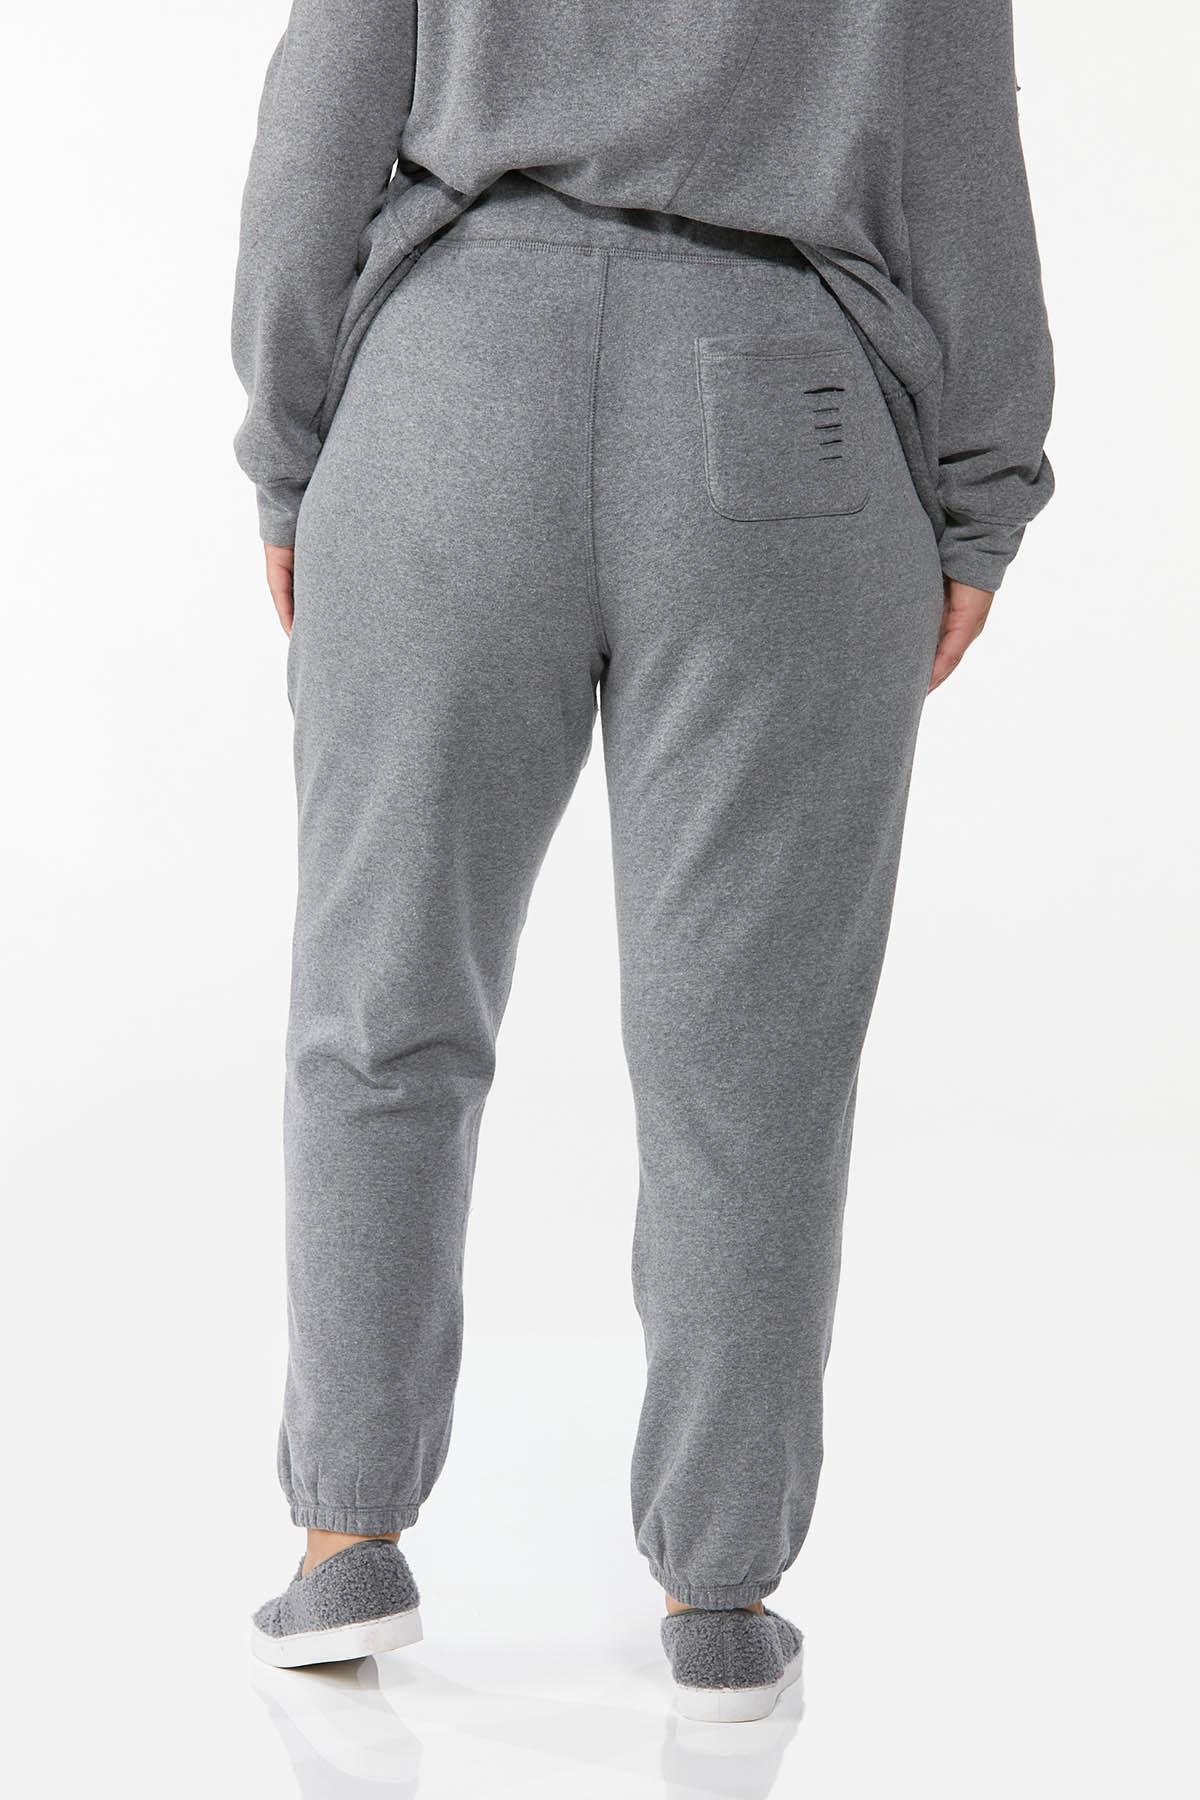 Plus Size Distressed Joggers (Item #44712305)